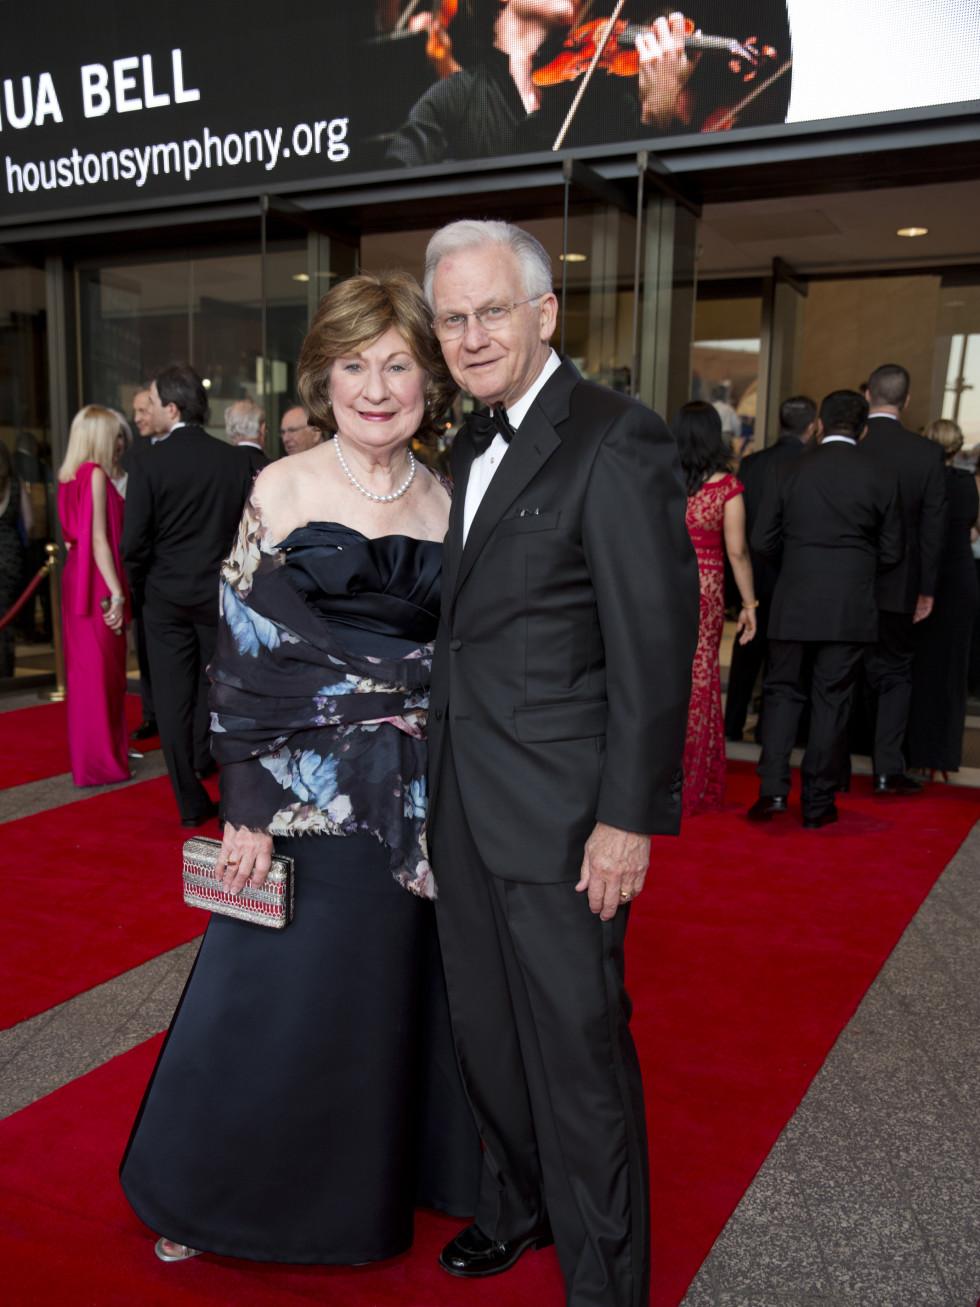 News, Shelby, Houston Symphony Opening Night, Sept. 2015, Cora Sue & Harry Mach